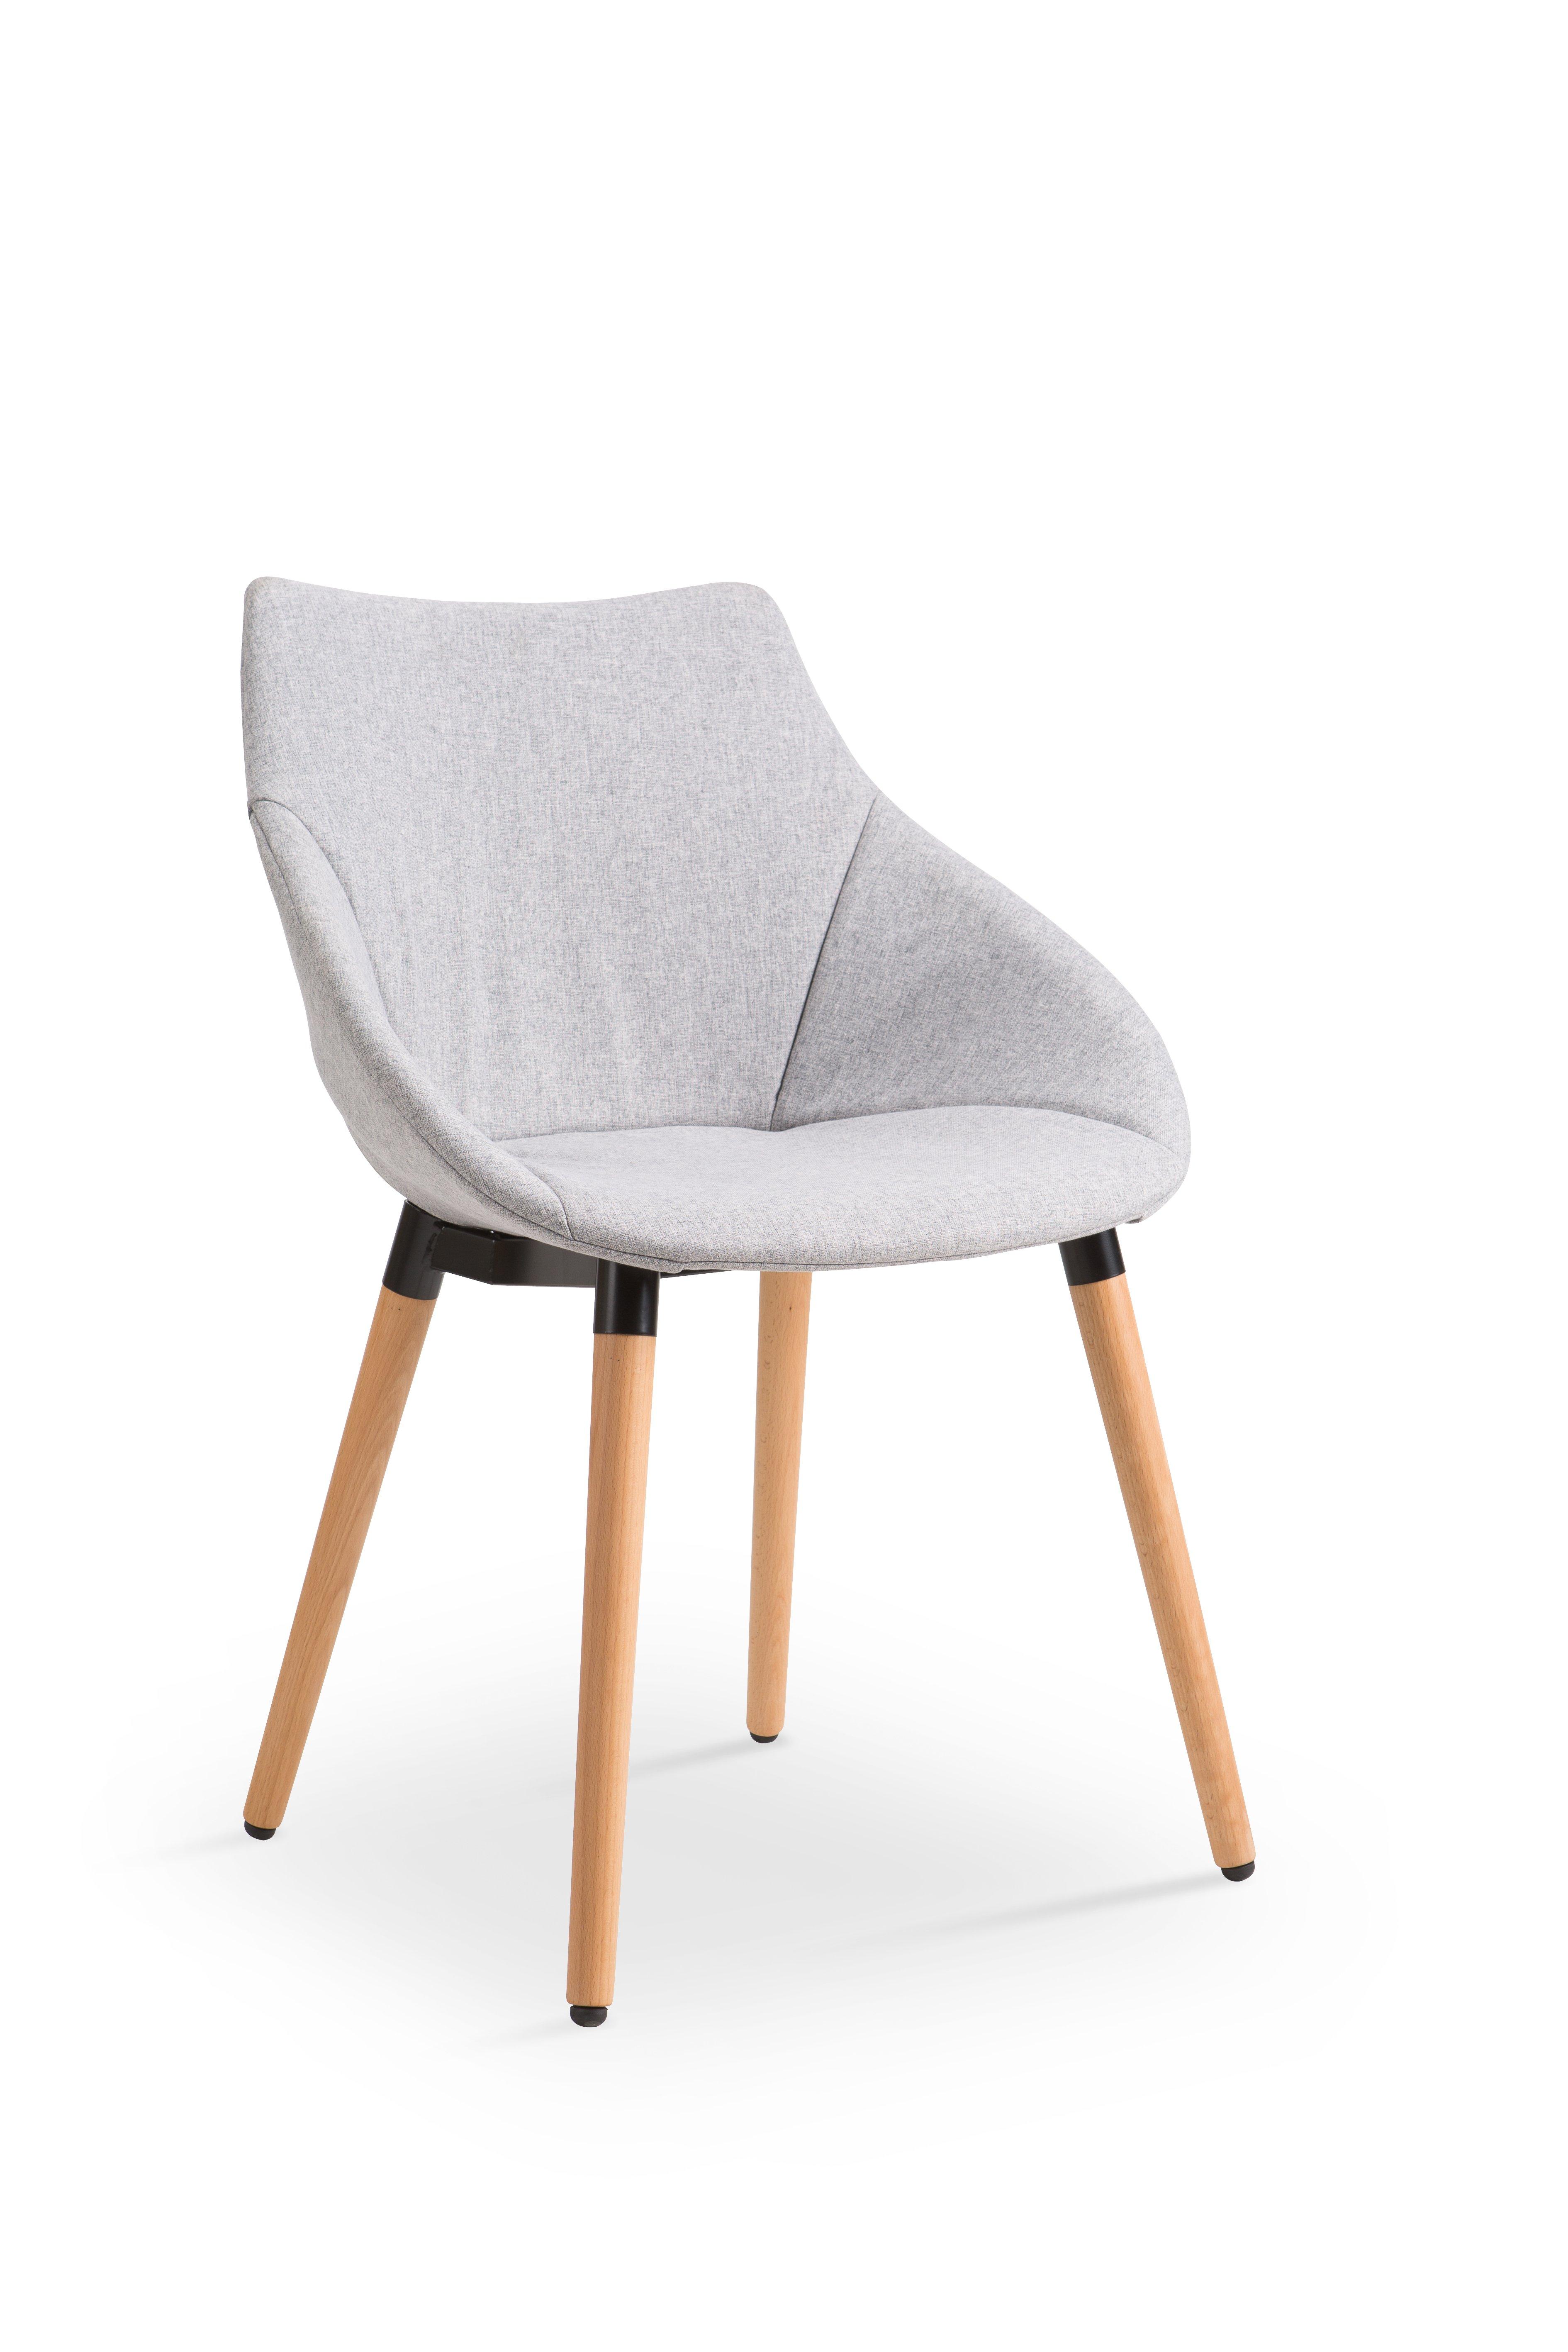 Scaun din lemn tapitat cu stofa K226